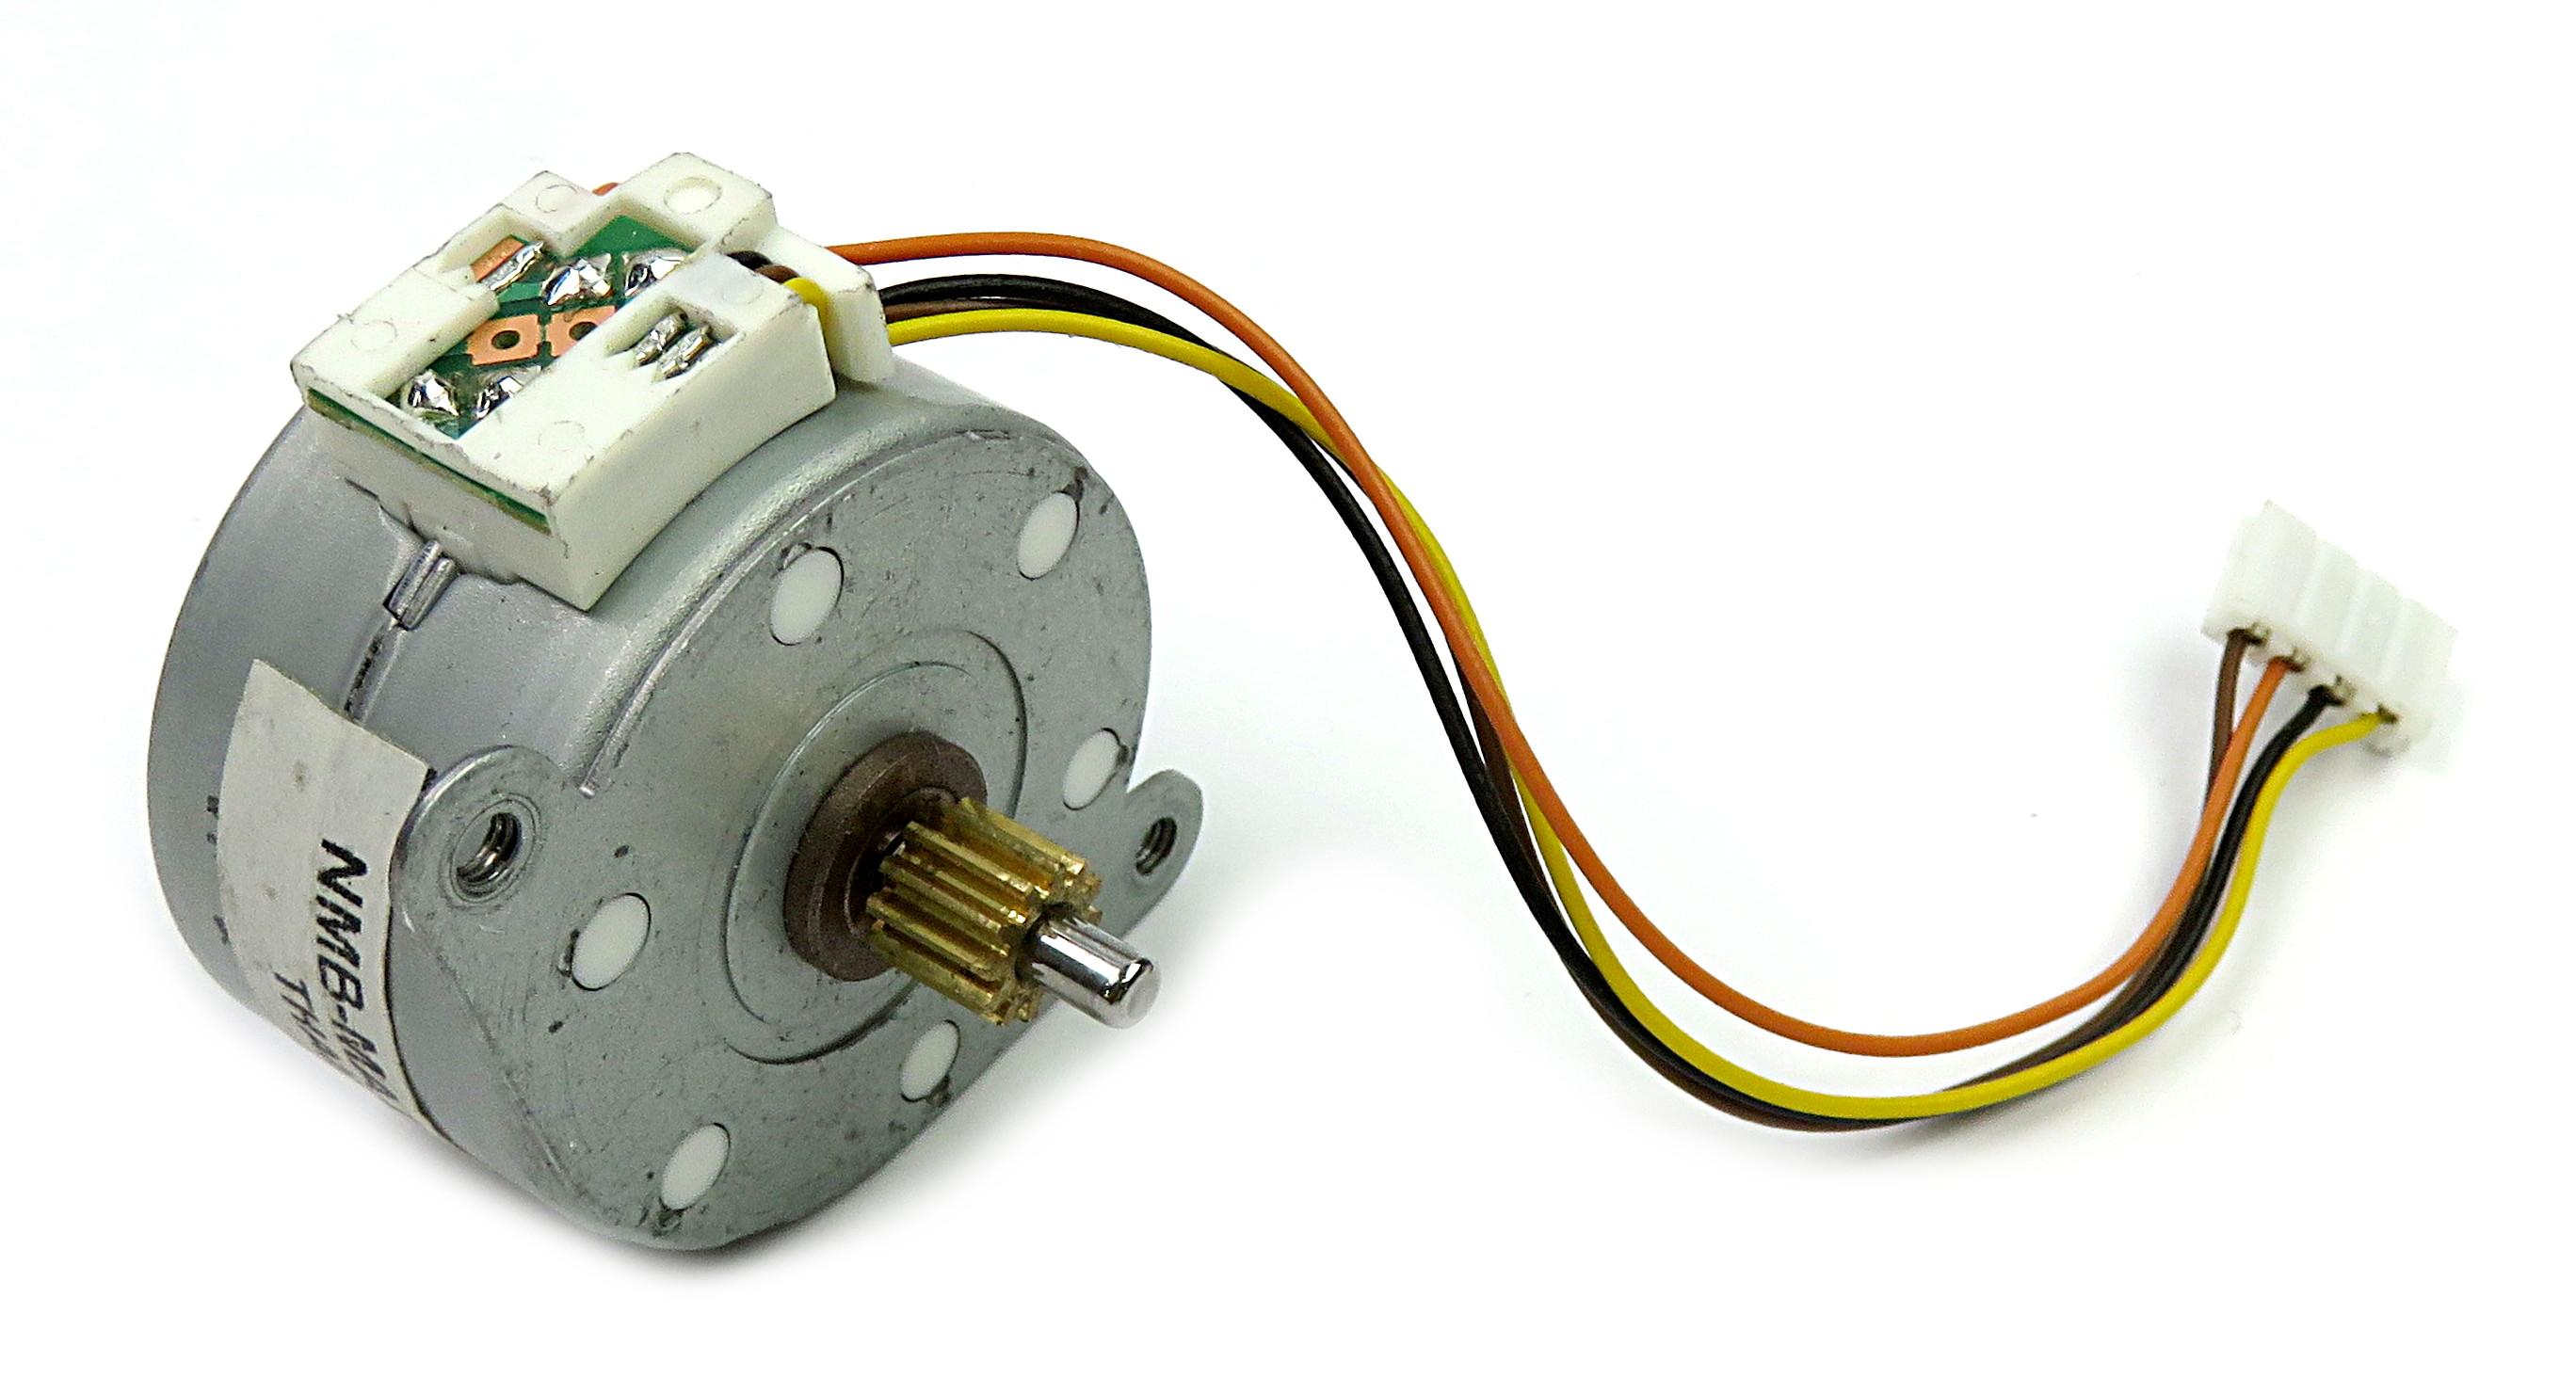 Minebea PM35L-048-ZFV9 48-Step/Rotation (7.5°/step) 24V Stepper Motor w/7mm gear